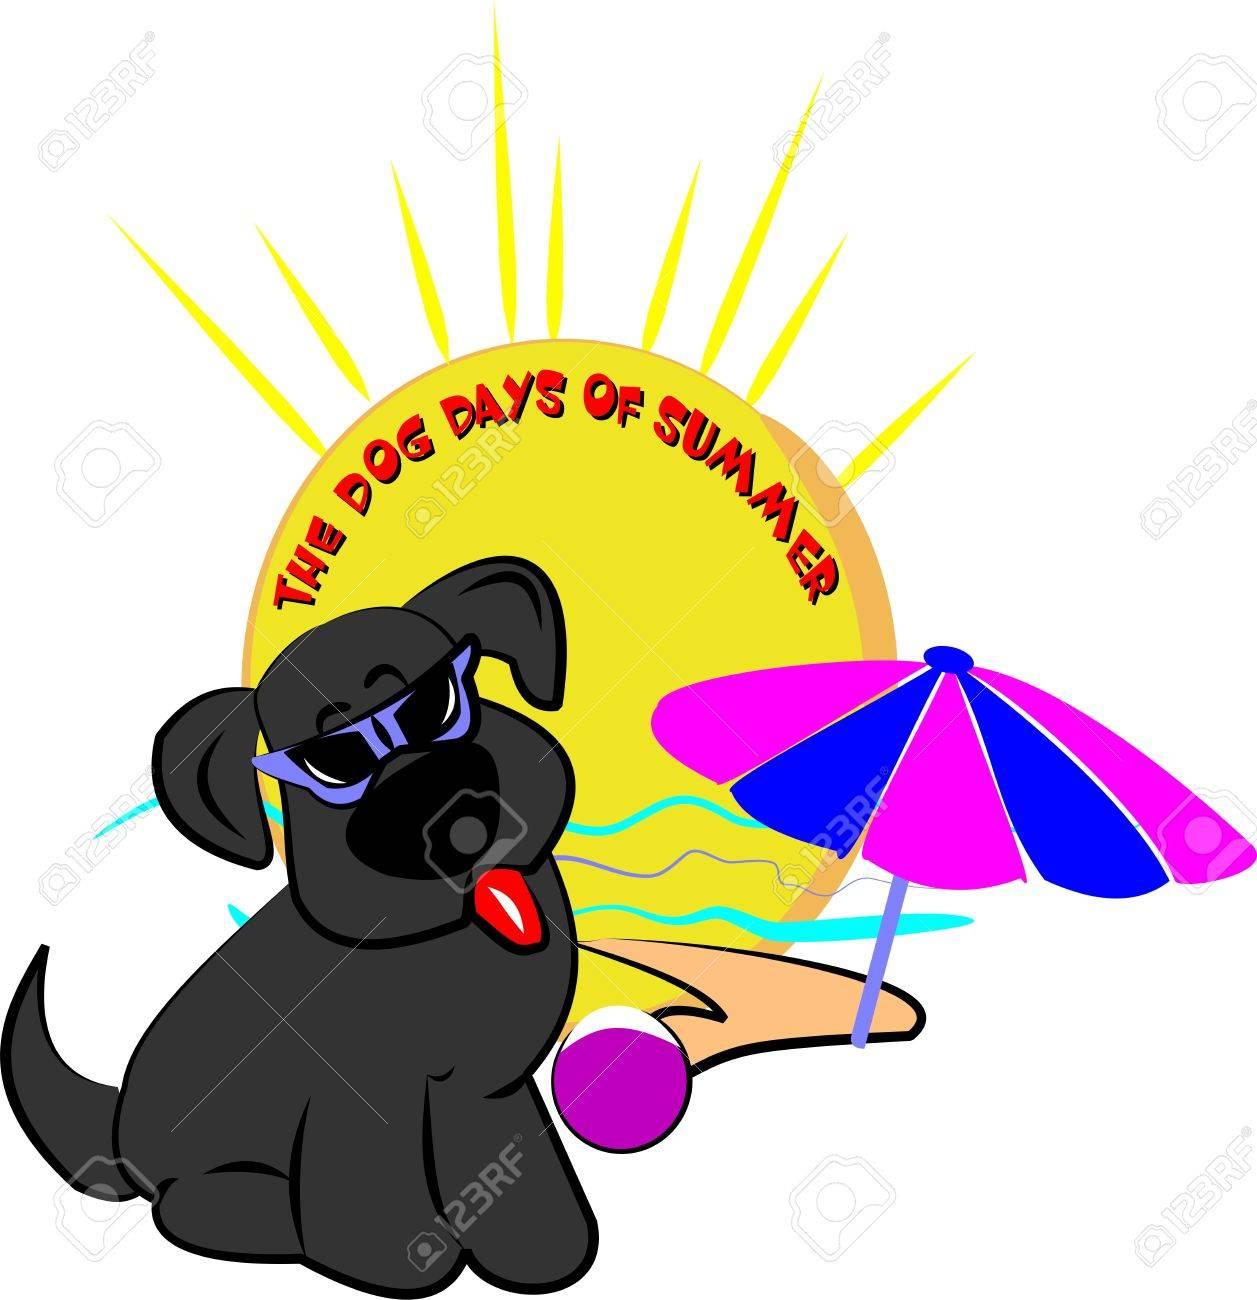 dog days of summer royalty free cliparts vectors and stock rh 123rf com Summer Border Clip Art Snoopy Summer Clip Art